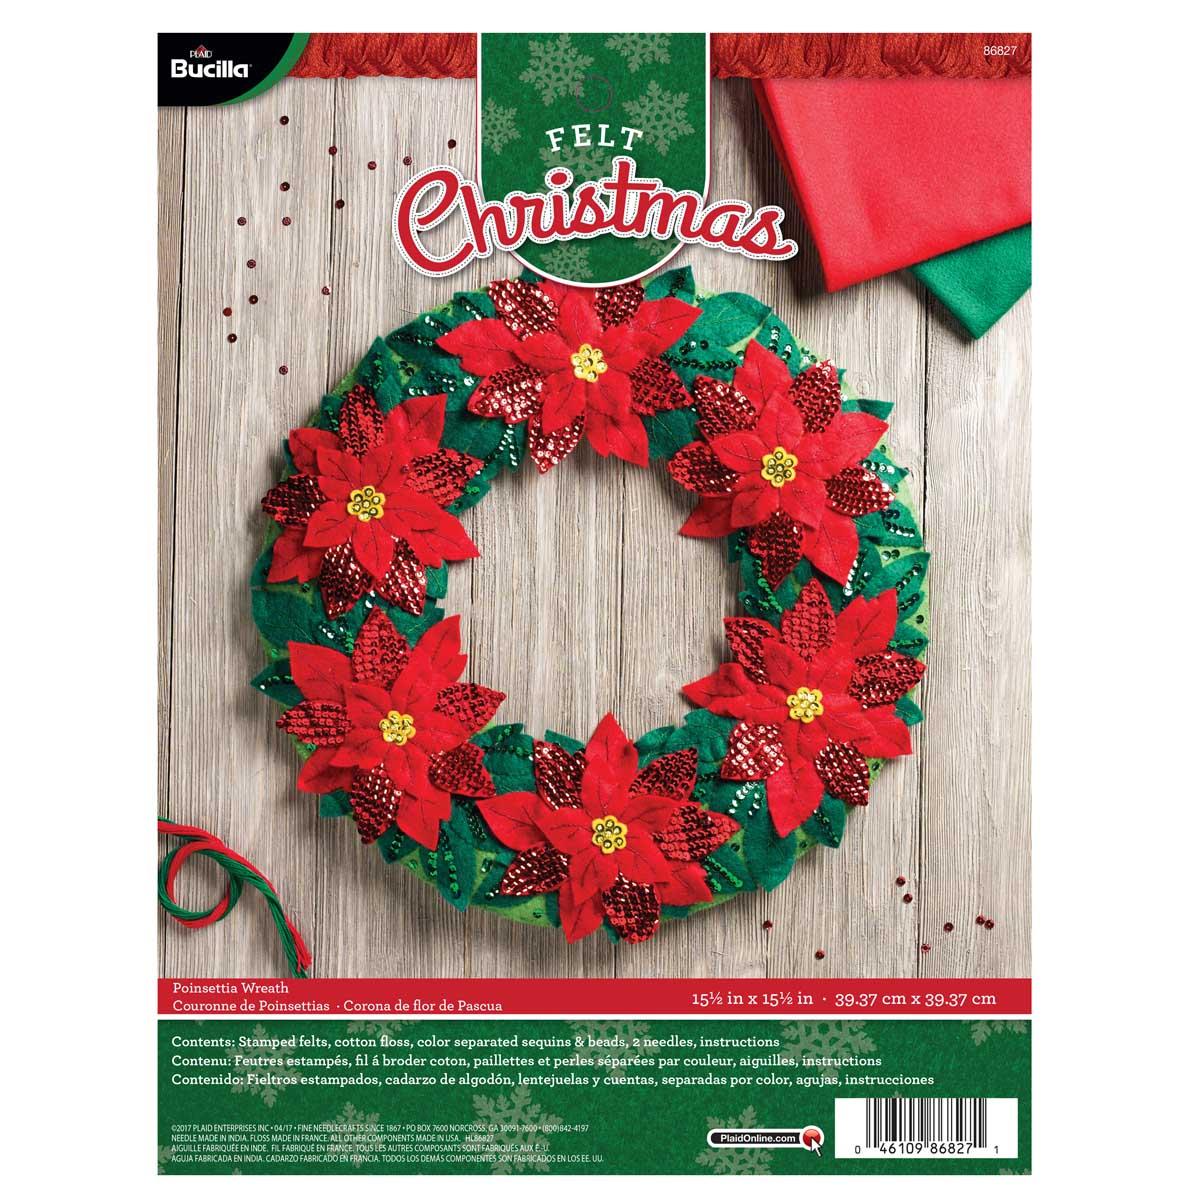 Bucilla ® Seasonal - Felt - Home Decor - Poinsettia Wreath